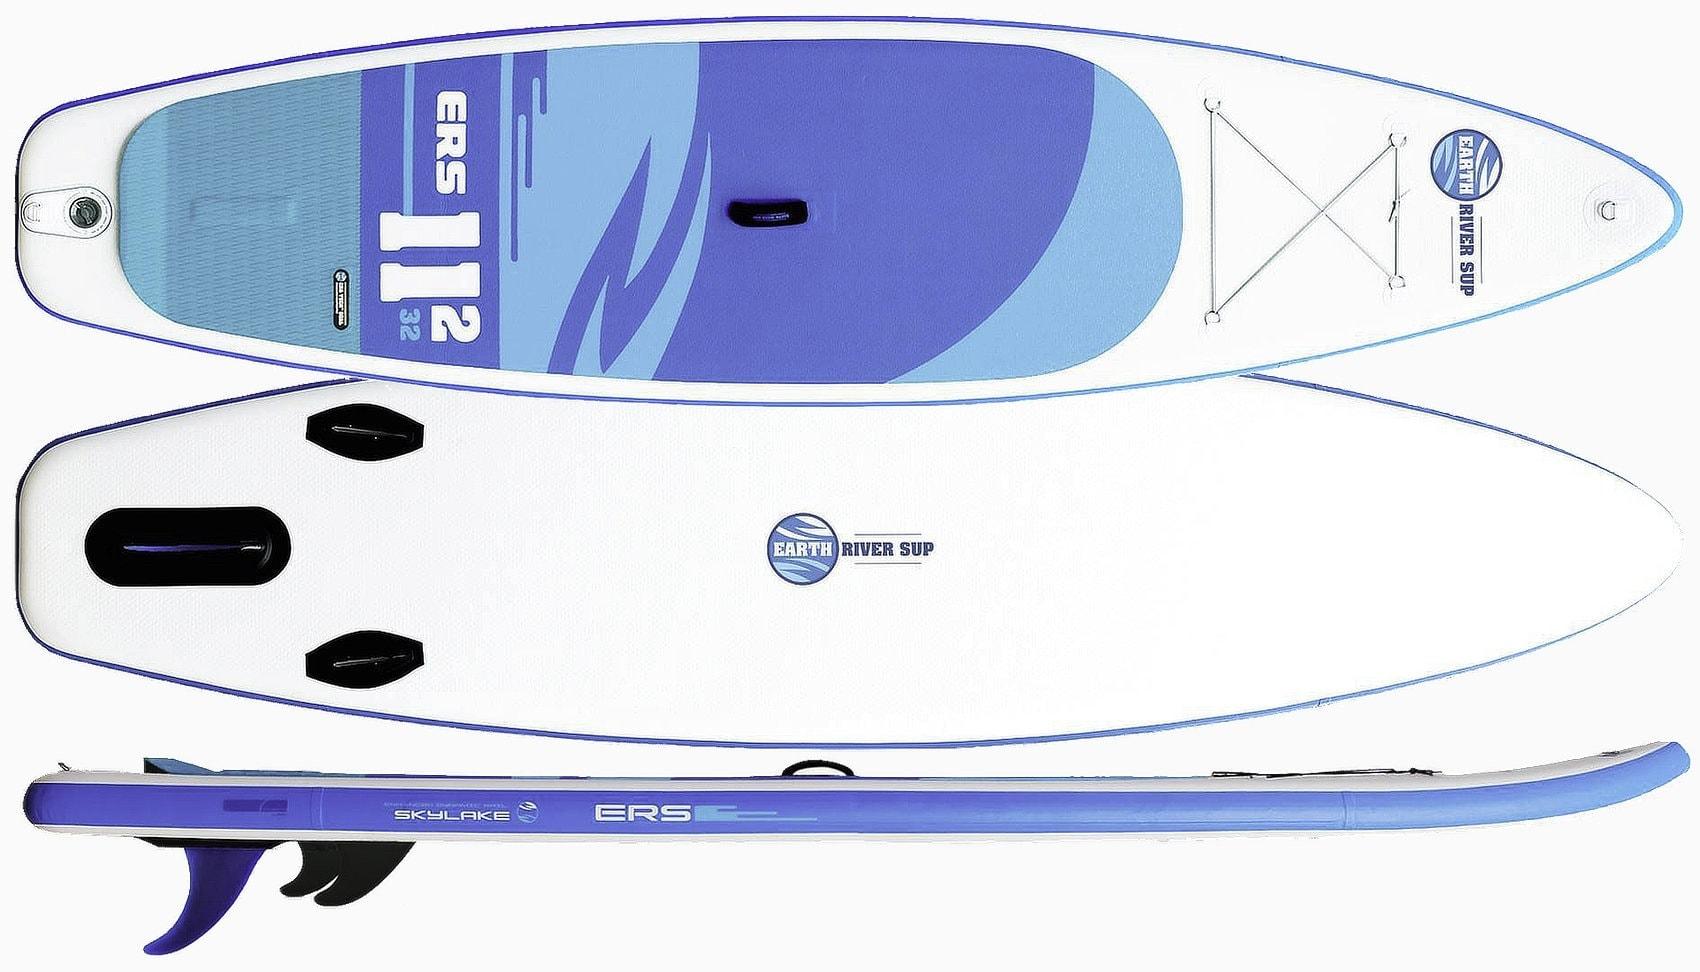 Earth River SUP 11-2 SKYLAKE GT